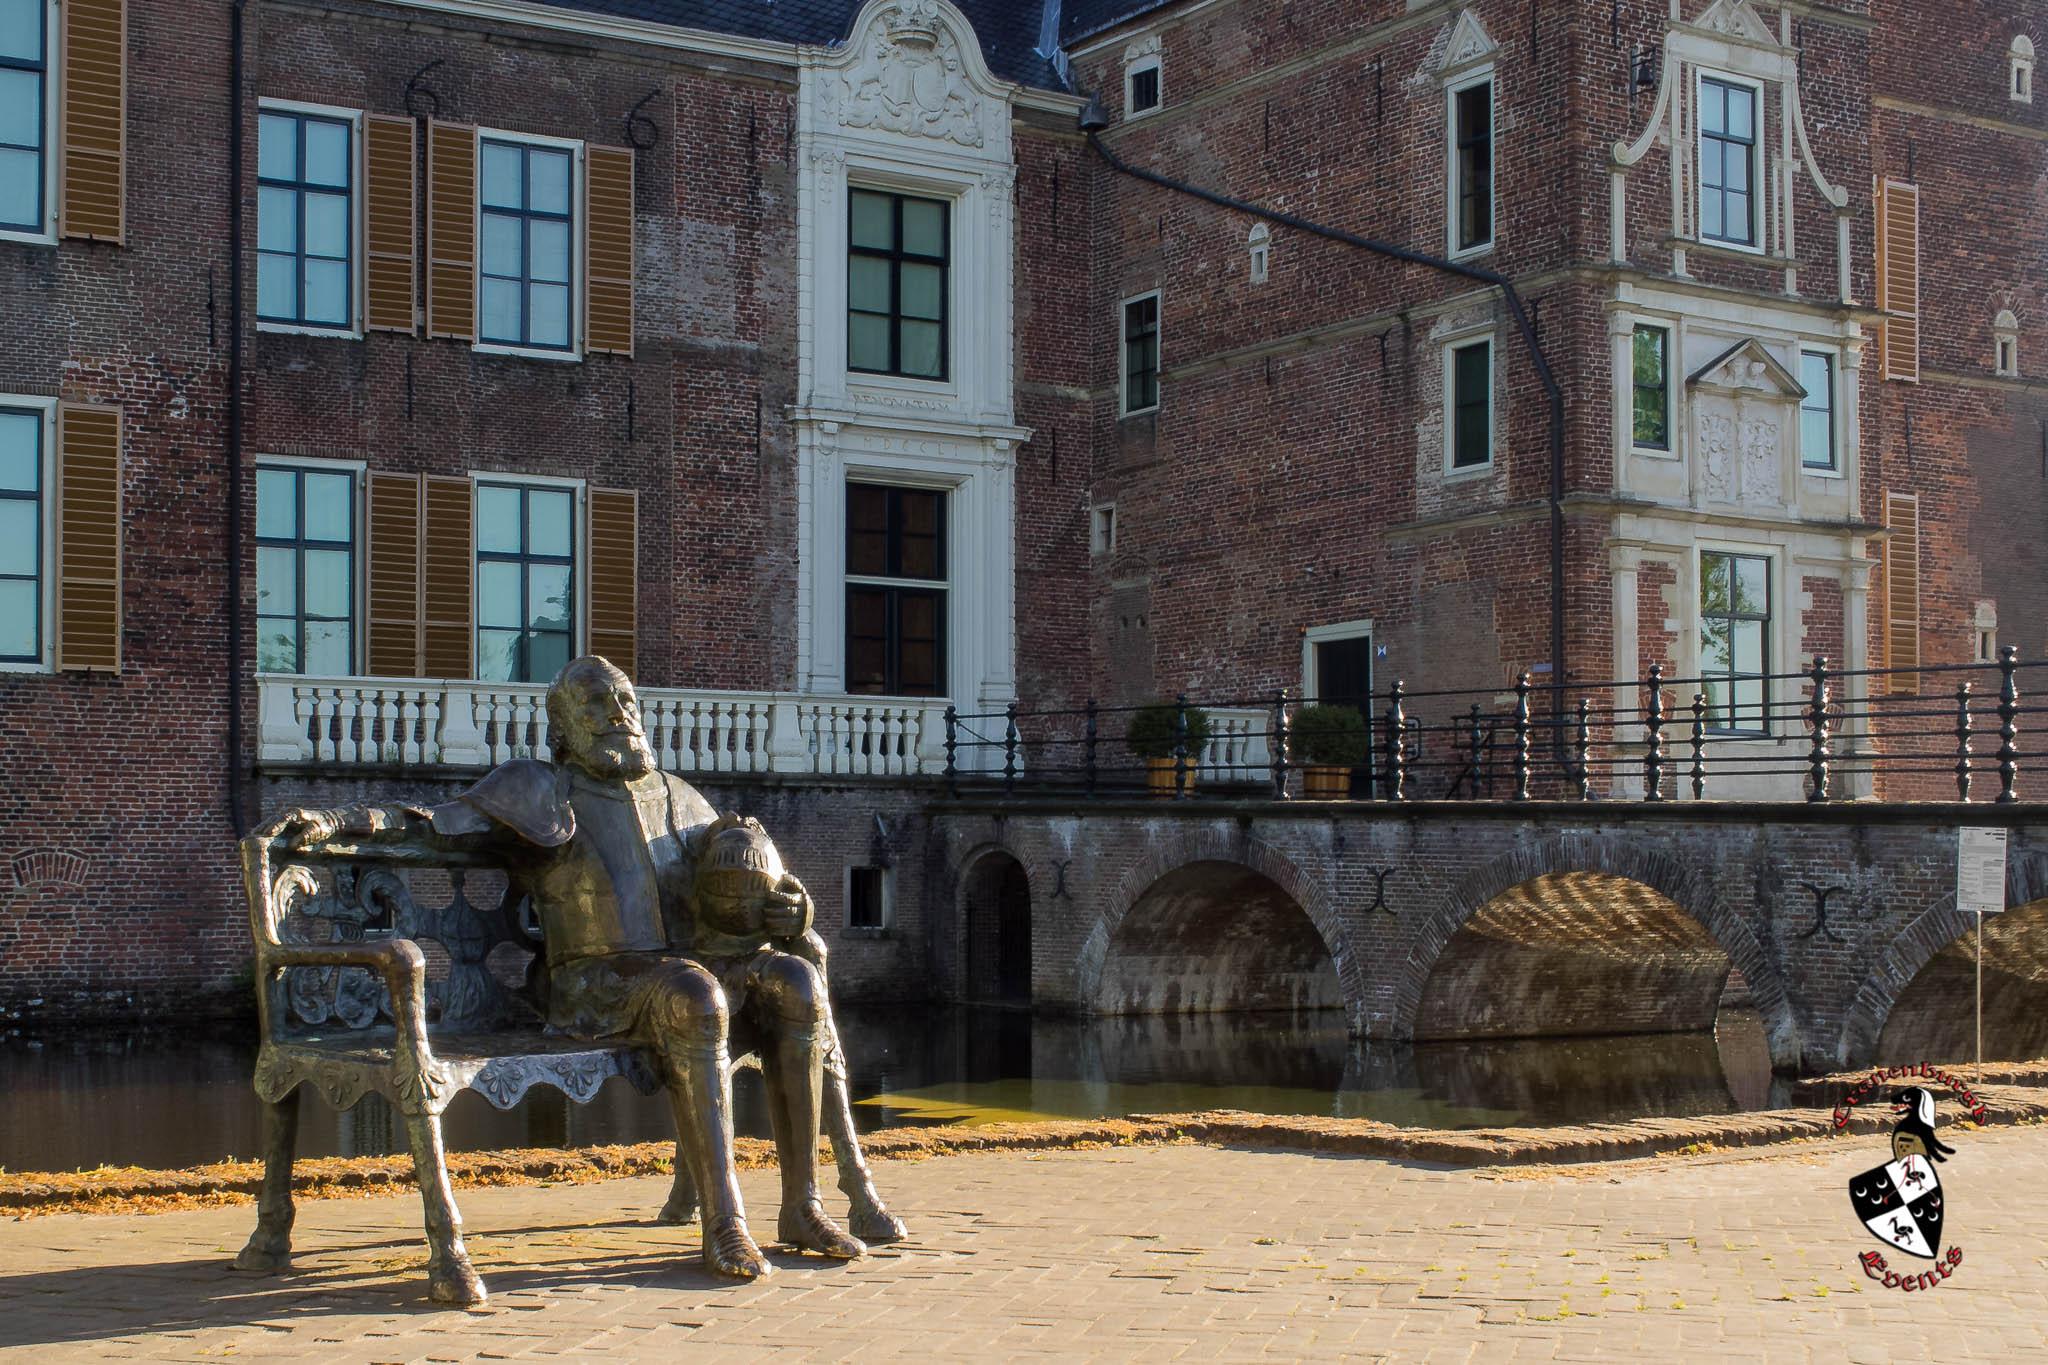 Middeleeuws-Festijn-Cannenburgh-2018-Algemeen-Ellen-la-Faille-1